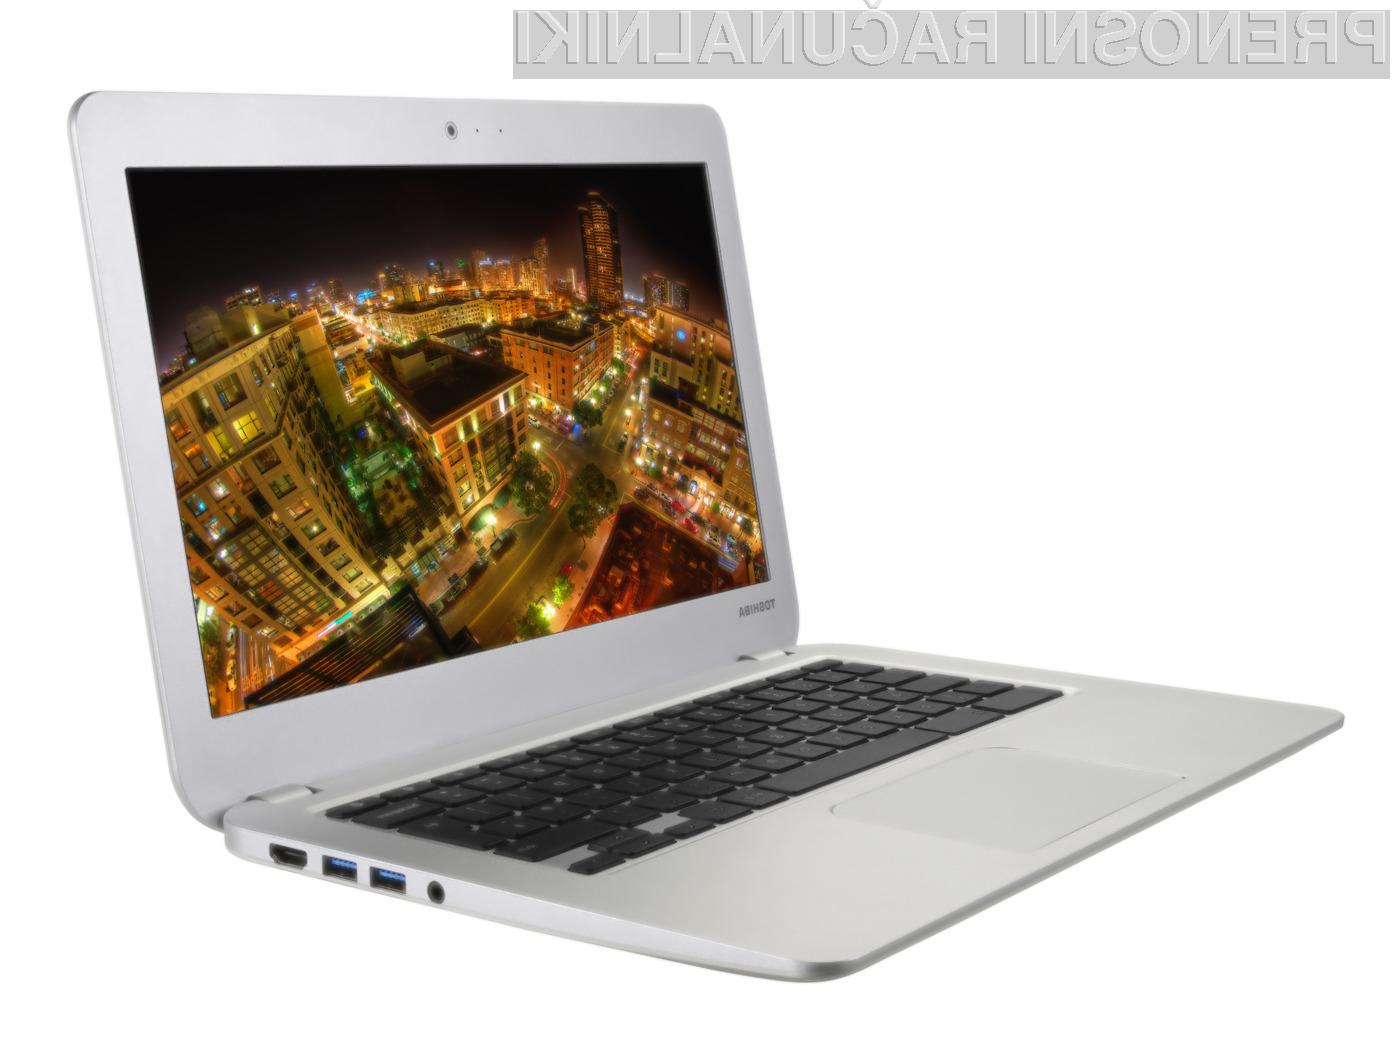 Toshiba napada z novim prenosnikom Chromebook